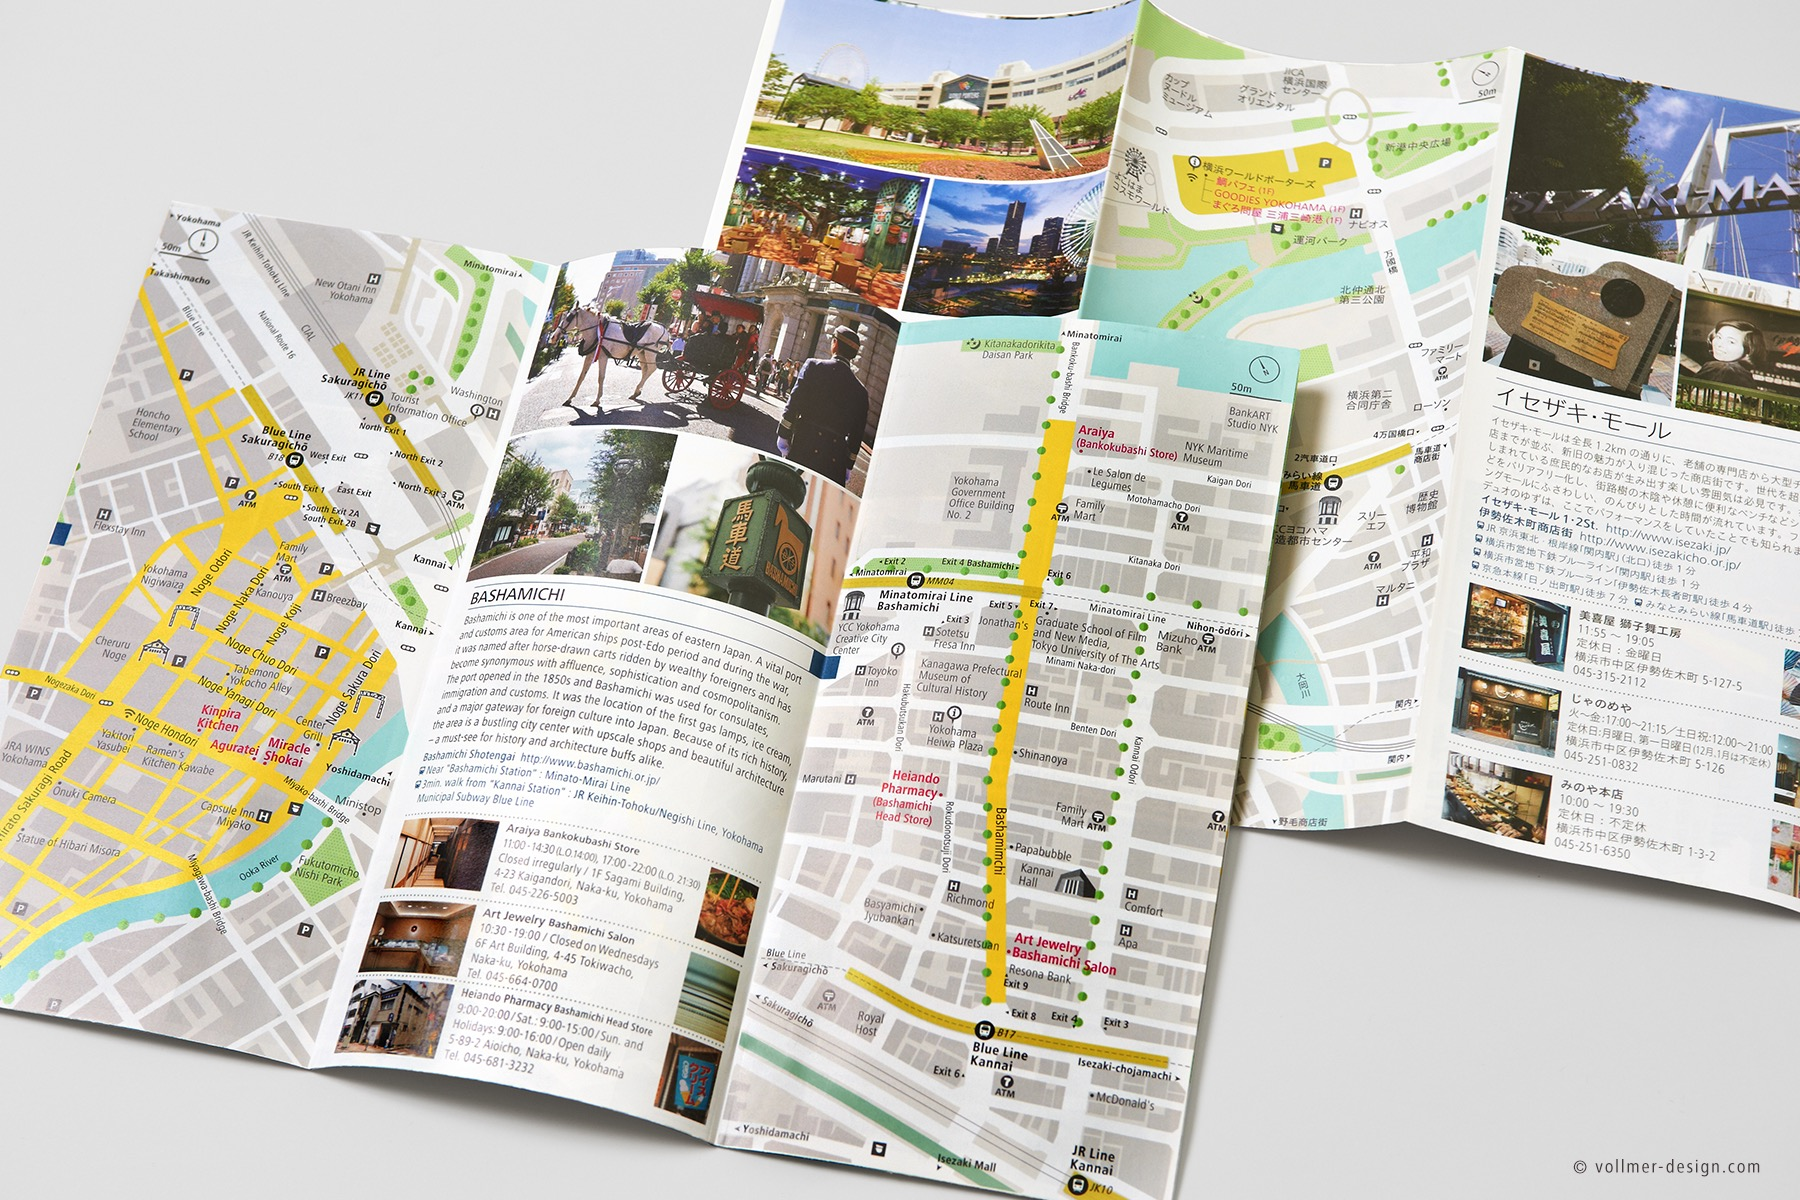 Maps of the Yokohama Shopping Street Guide Map